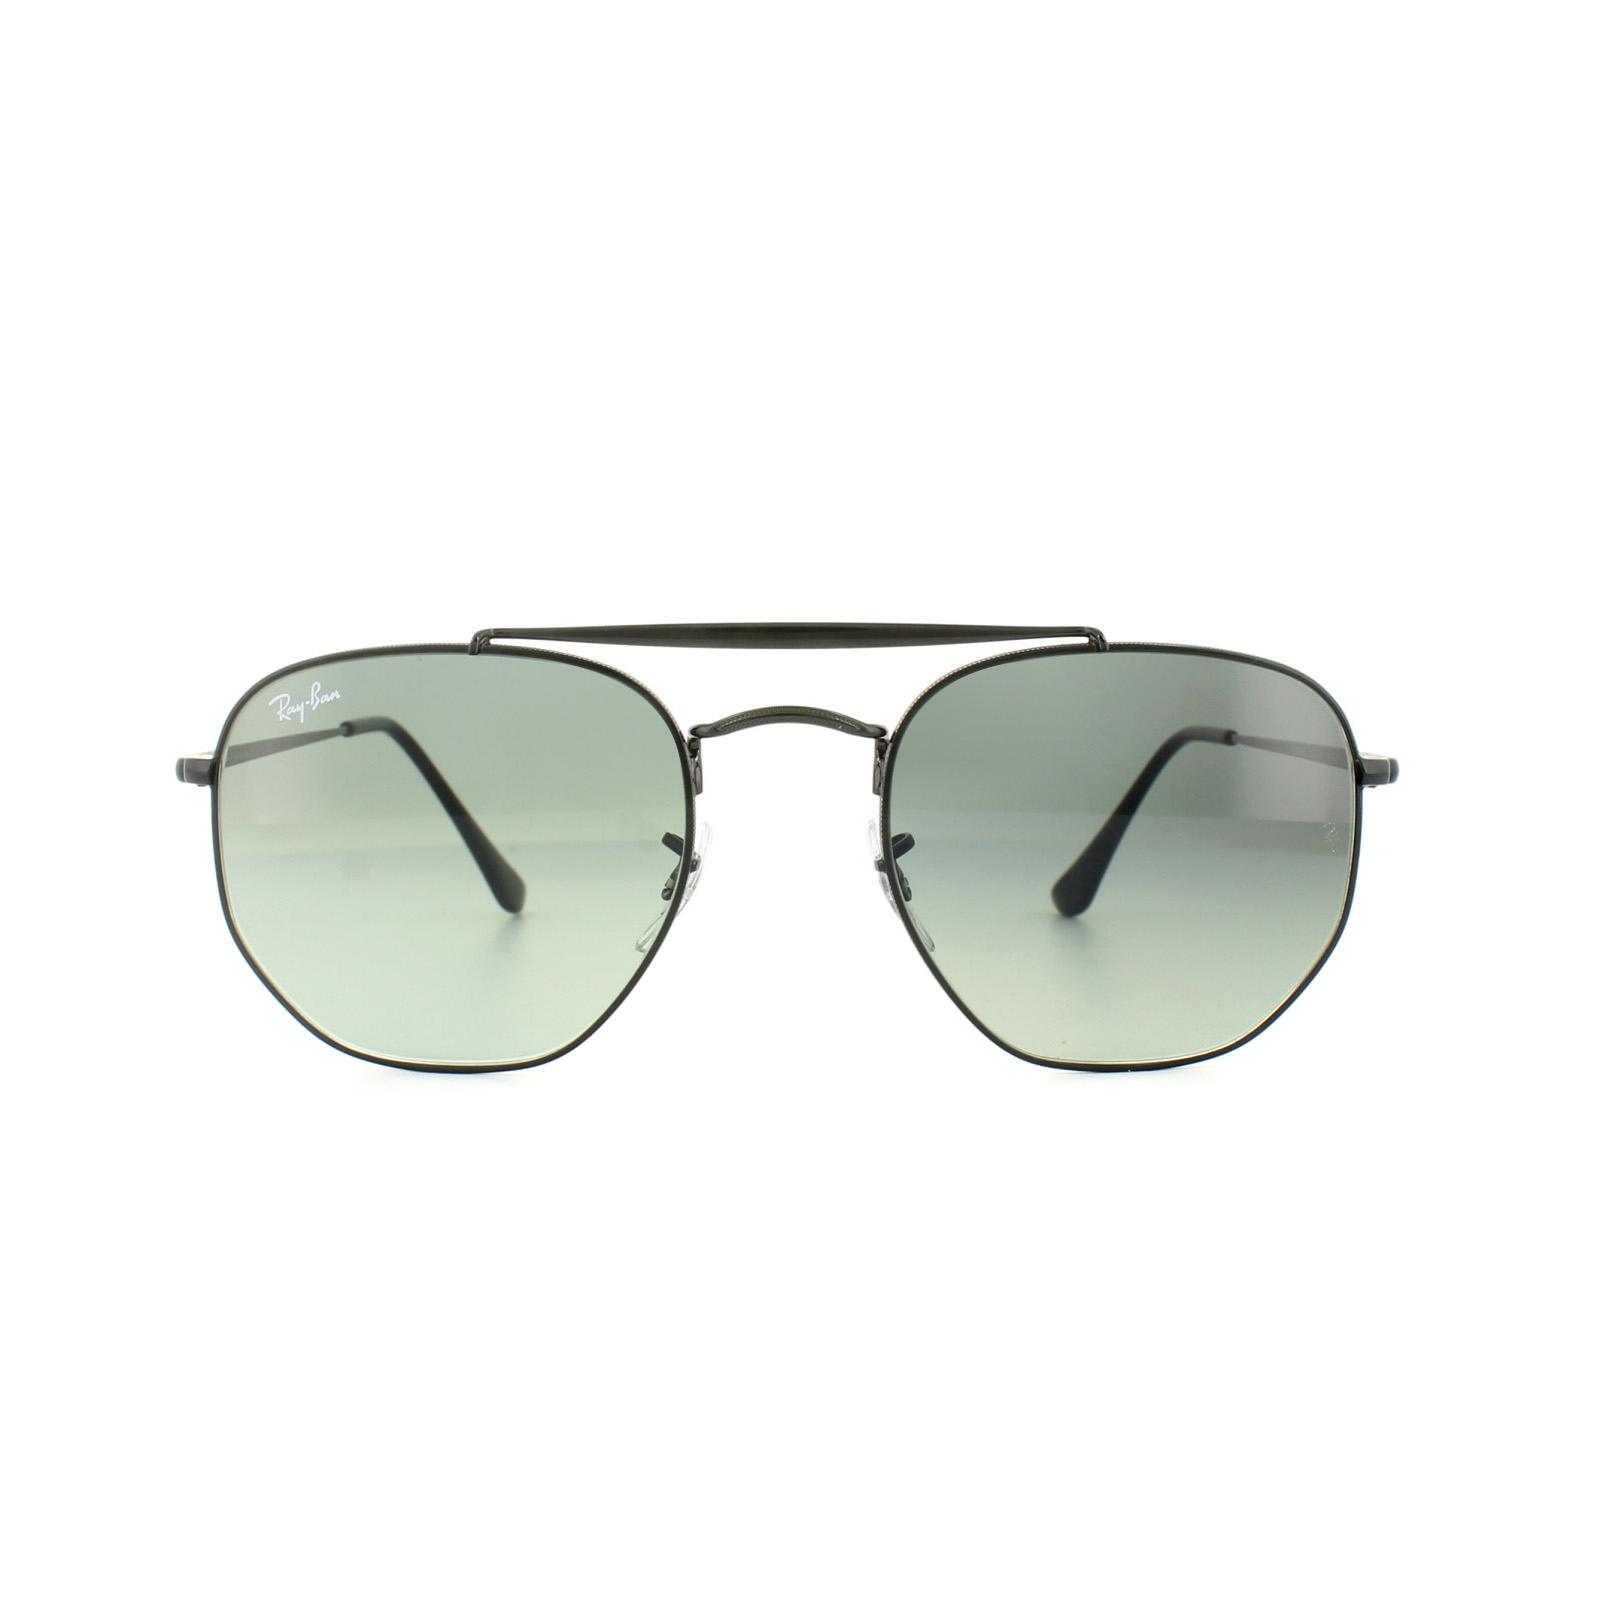 1e3a3a27fc Sentinel Ray-Ban Sunglasses Marshal 3648 002 71 Black Grey Gradient